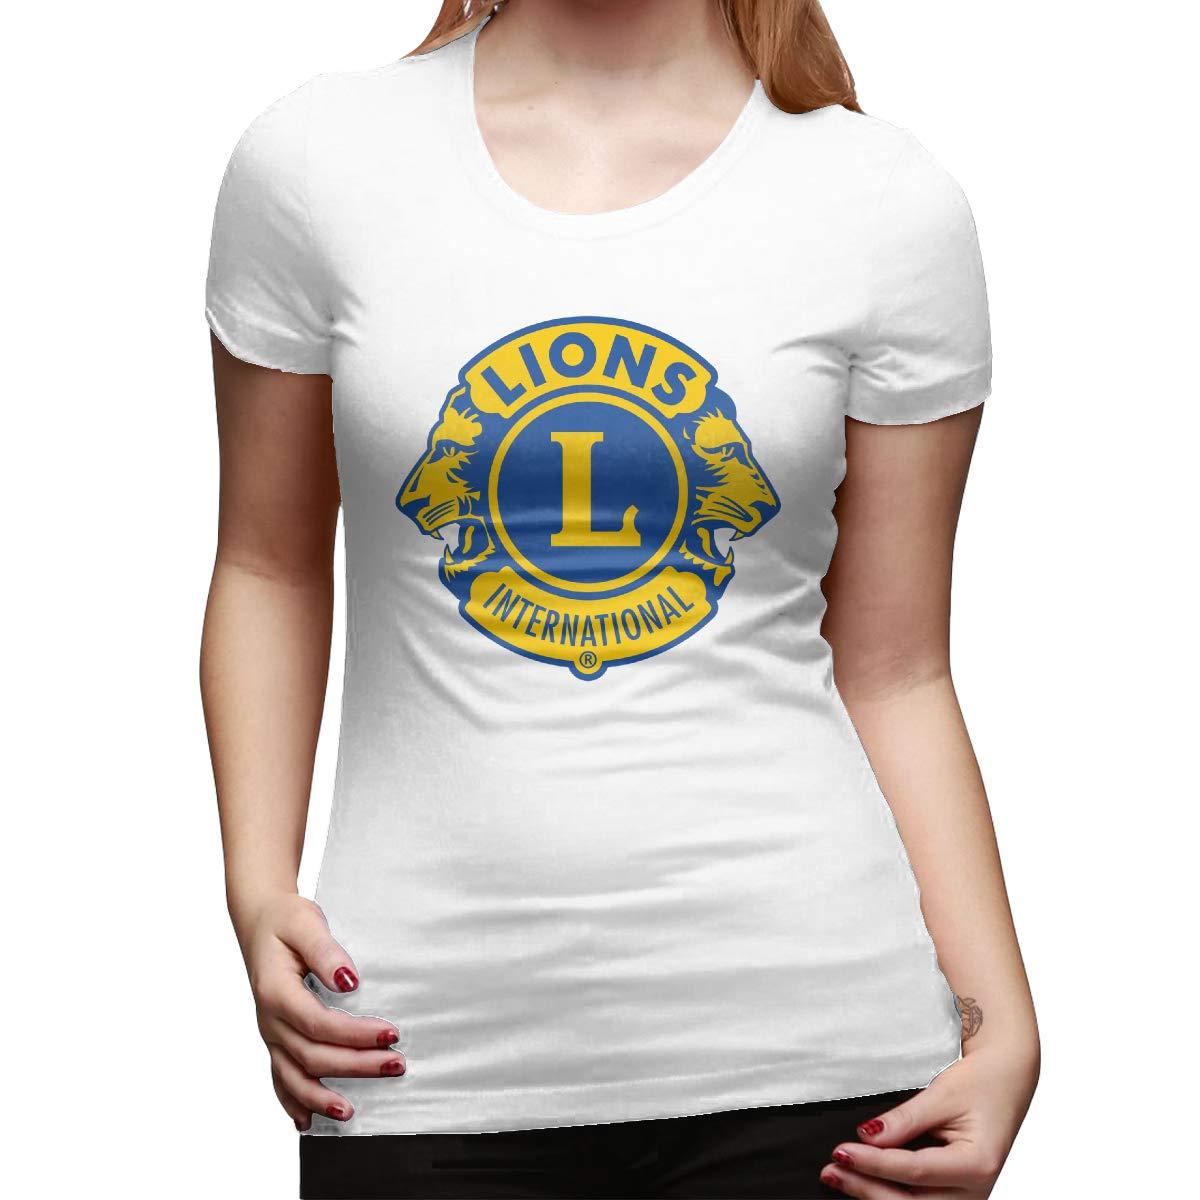 Spower Tee Lions Clubs International Logo Classic Tshirt With Short Sleeve